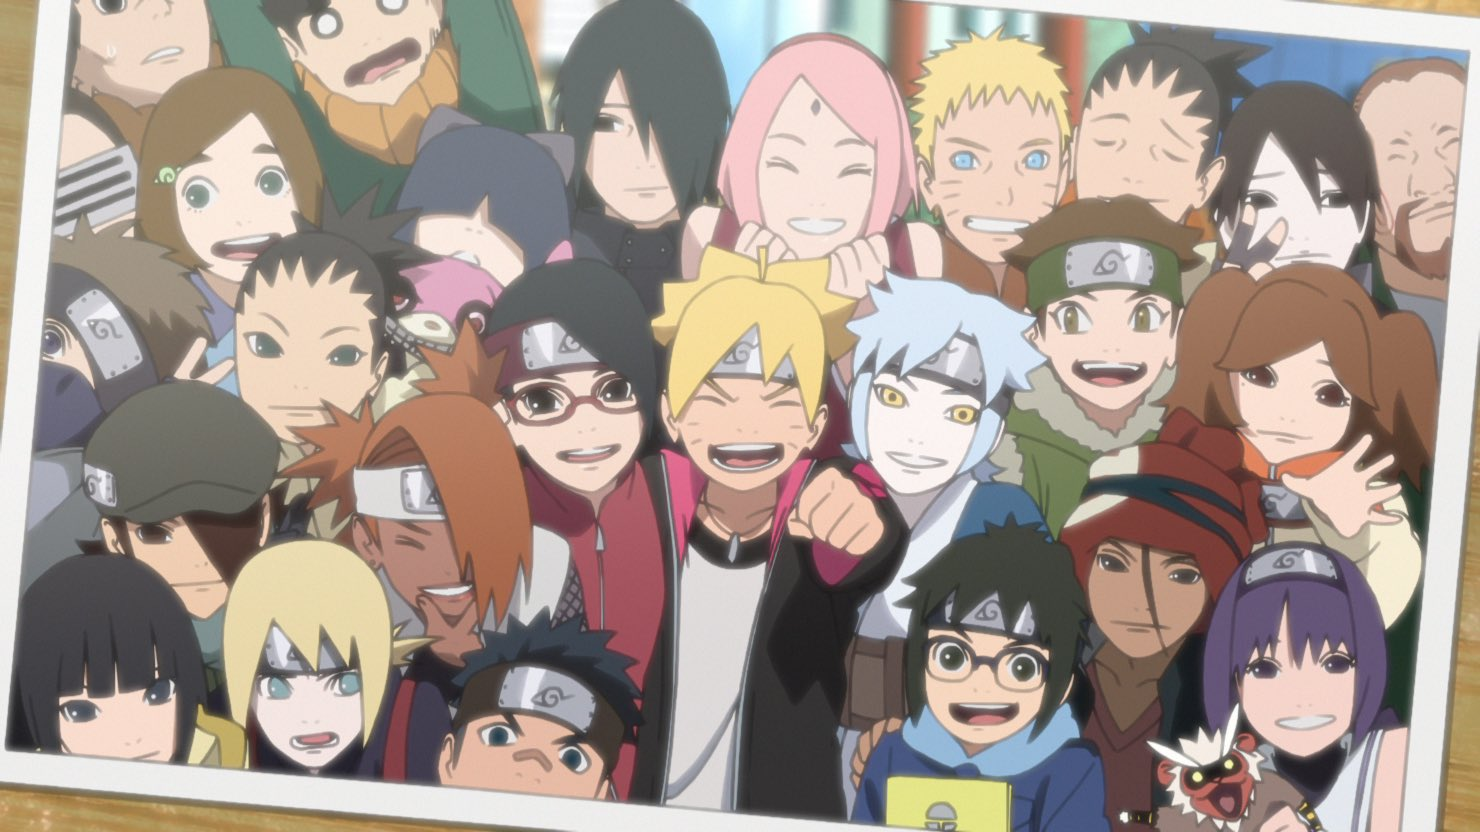 boruto naruto next generations boruto club 41851071 1480 832 - Boruto : The Next Generations Tanıtım ve İnceleme - Figurex Anime Tanıtımları